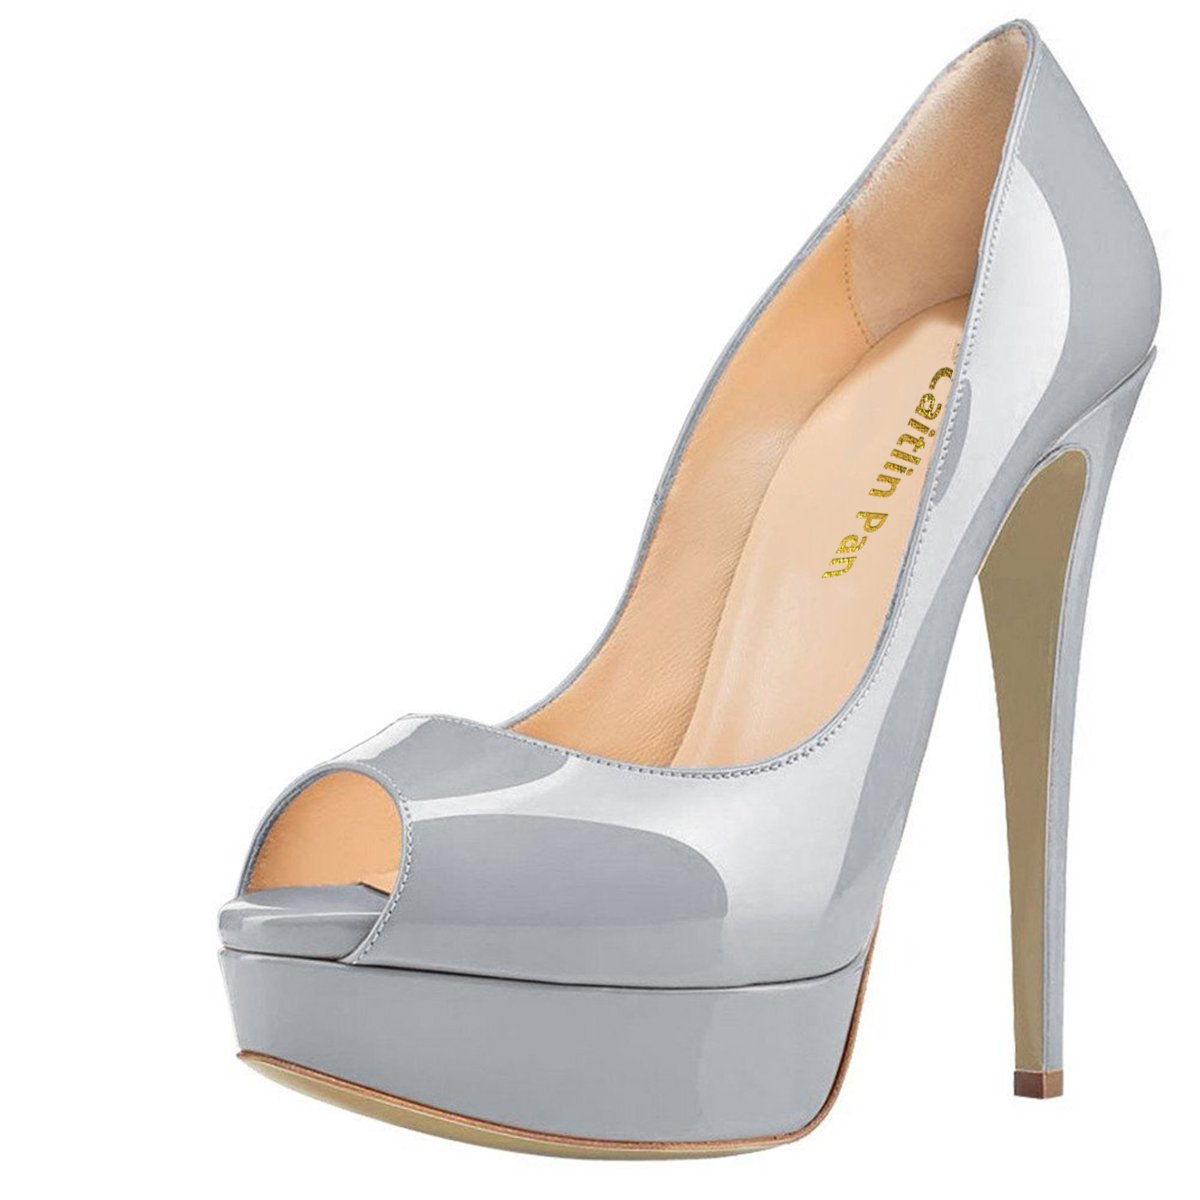 Caitlin Pan Womens Peep Toe Pumps Platform Stiletto Sandals High Heels Slip On Dress Pumps 5-14 US B07FCF9QL1 11 M US|Grey/Red B0tt0m